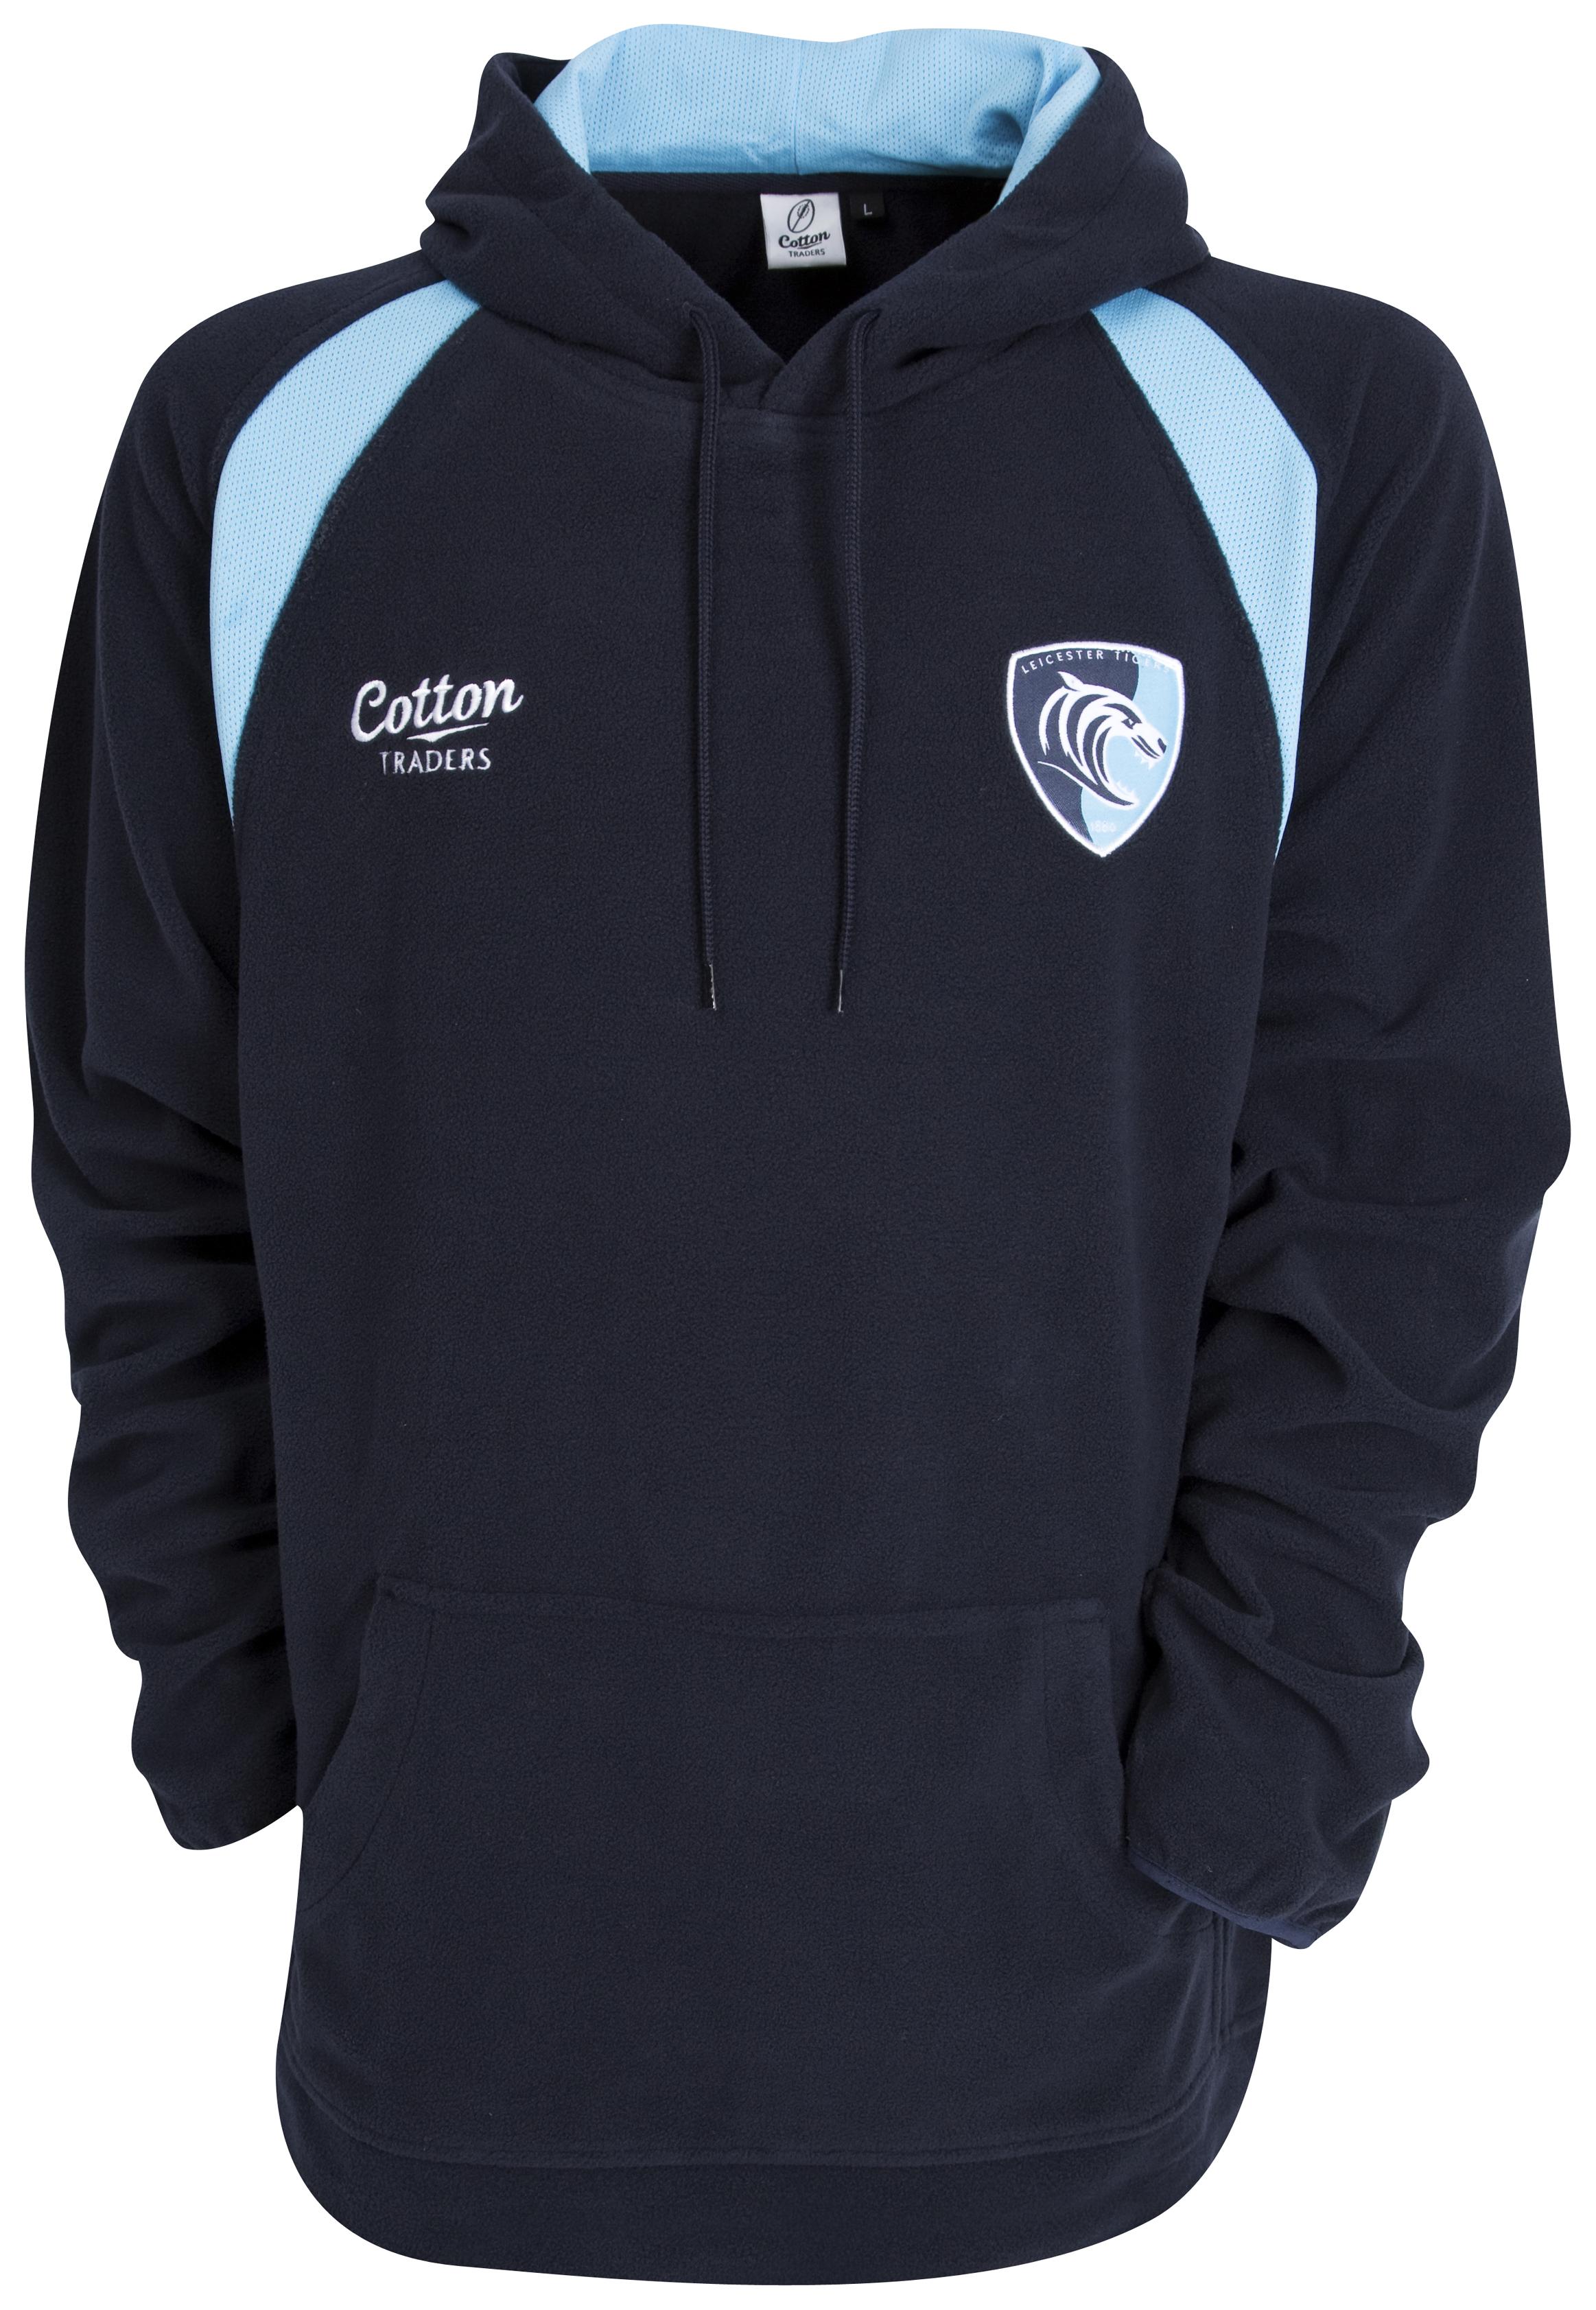 Leicester Tigers Hooded Sweatshirt - Navy/Sky